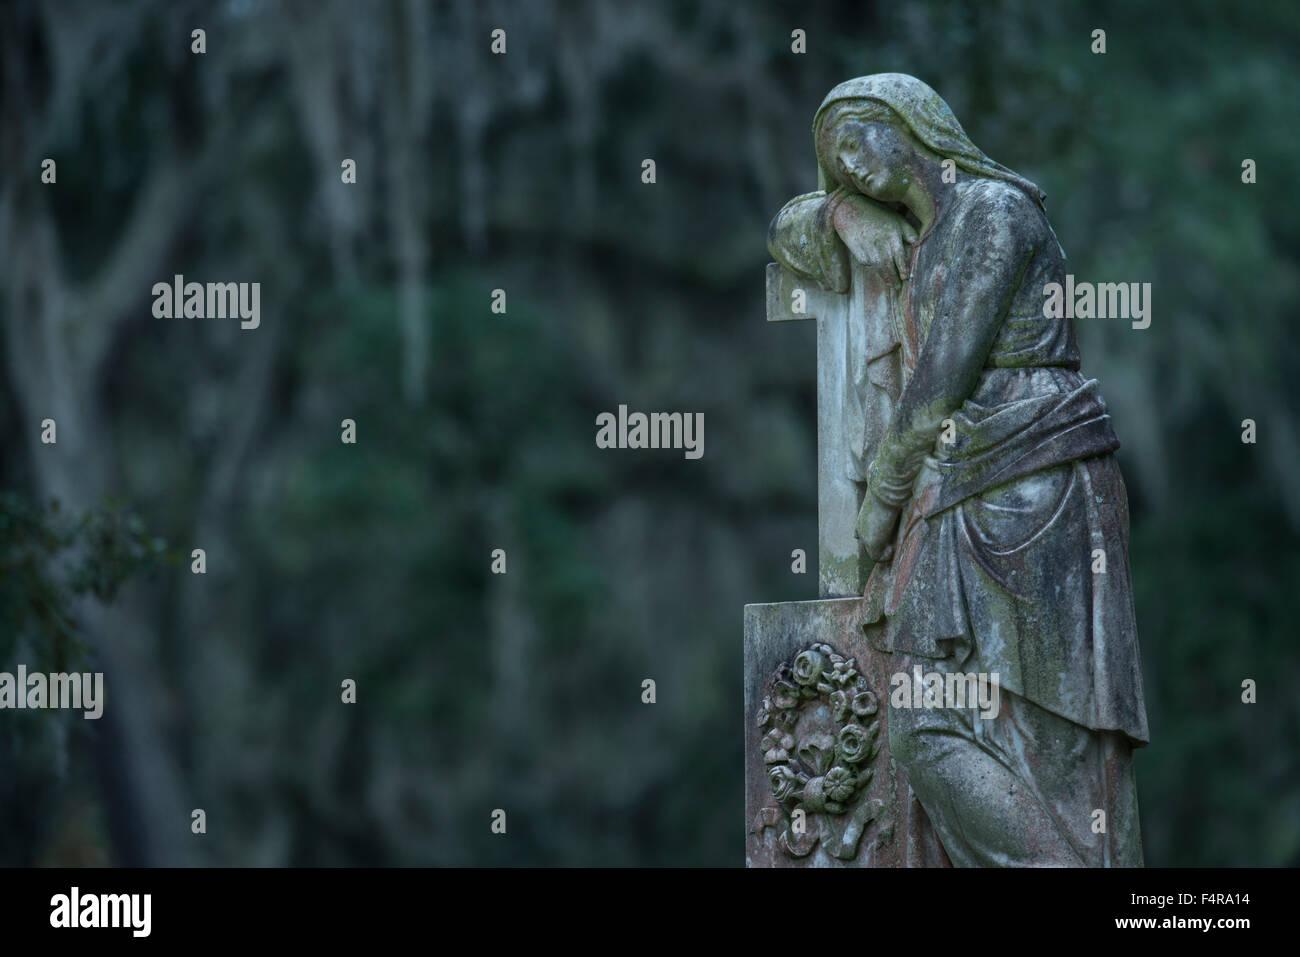 USA, United States, America, Georgia, southern, Savannah, Bonaventure, cemetery, graveyard, statue, - Stock Image